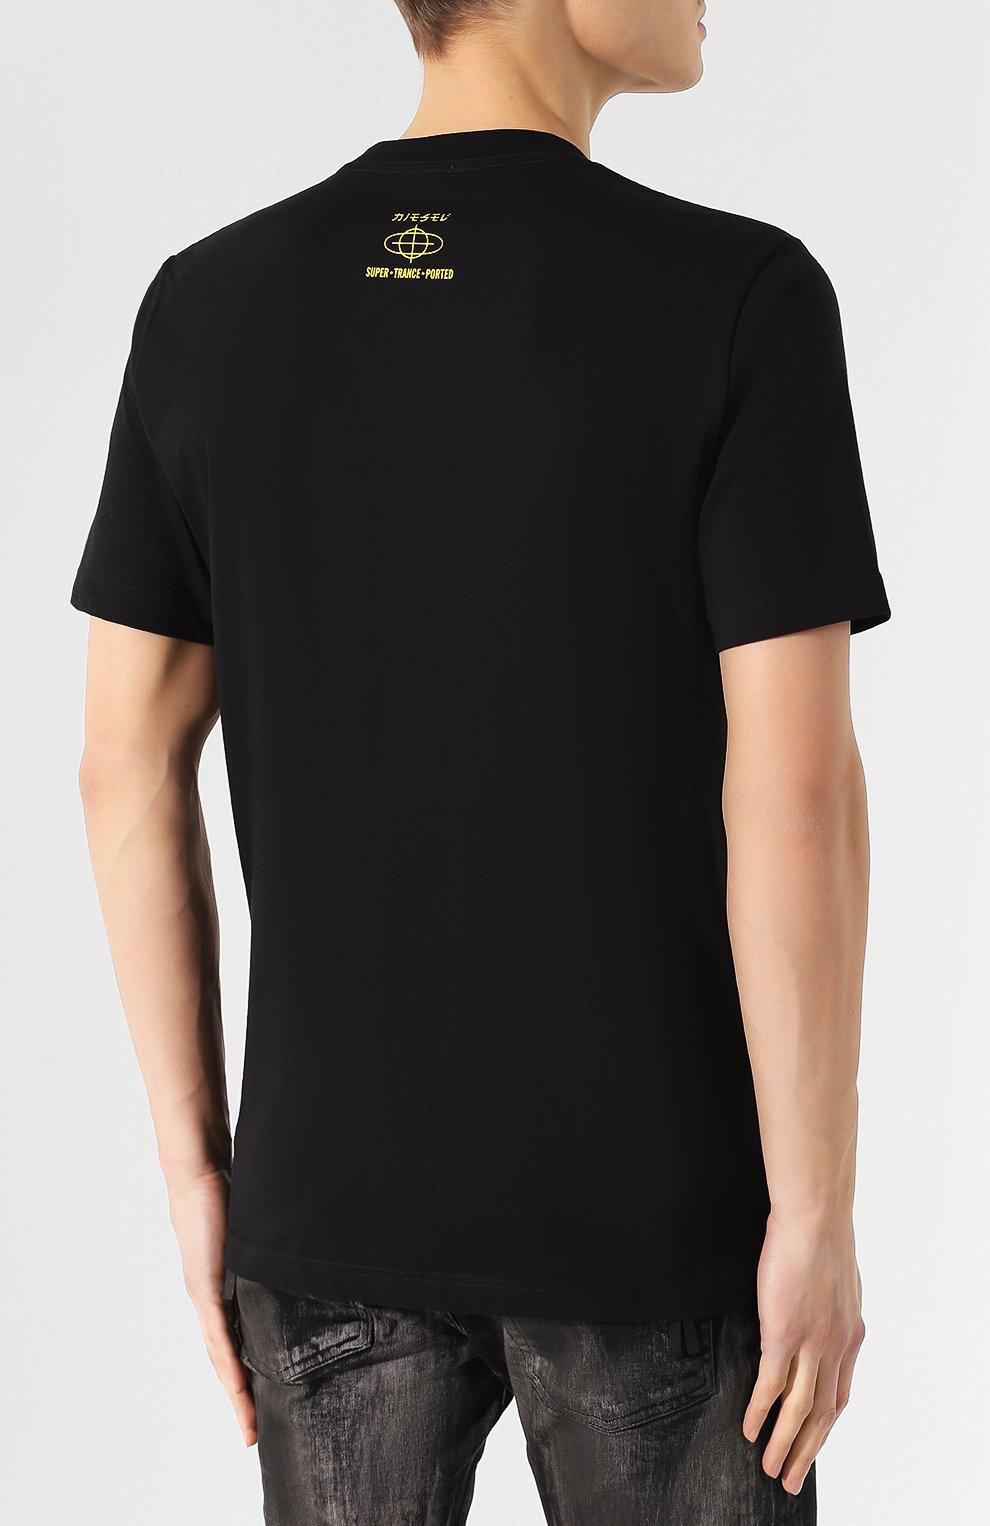 Хлопковая футболка  Diesel черная   Фото №4